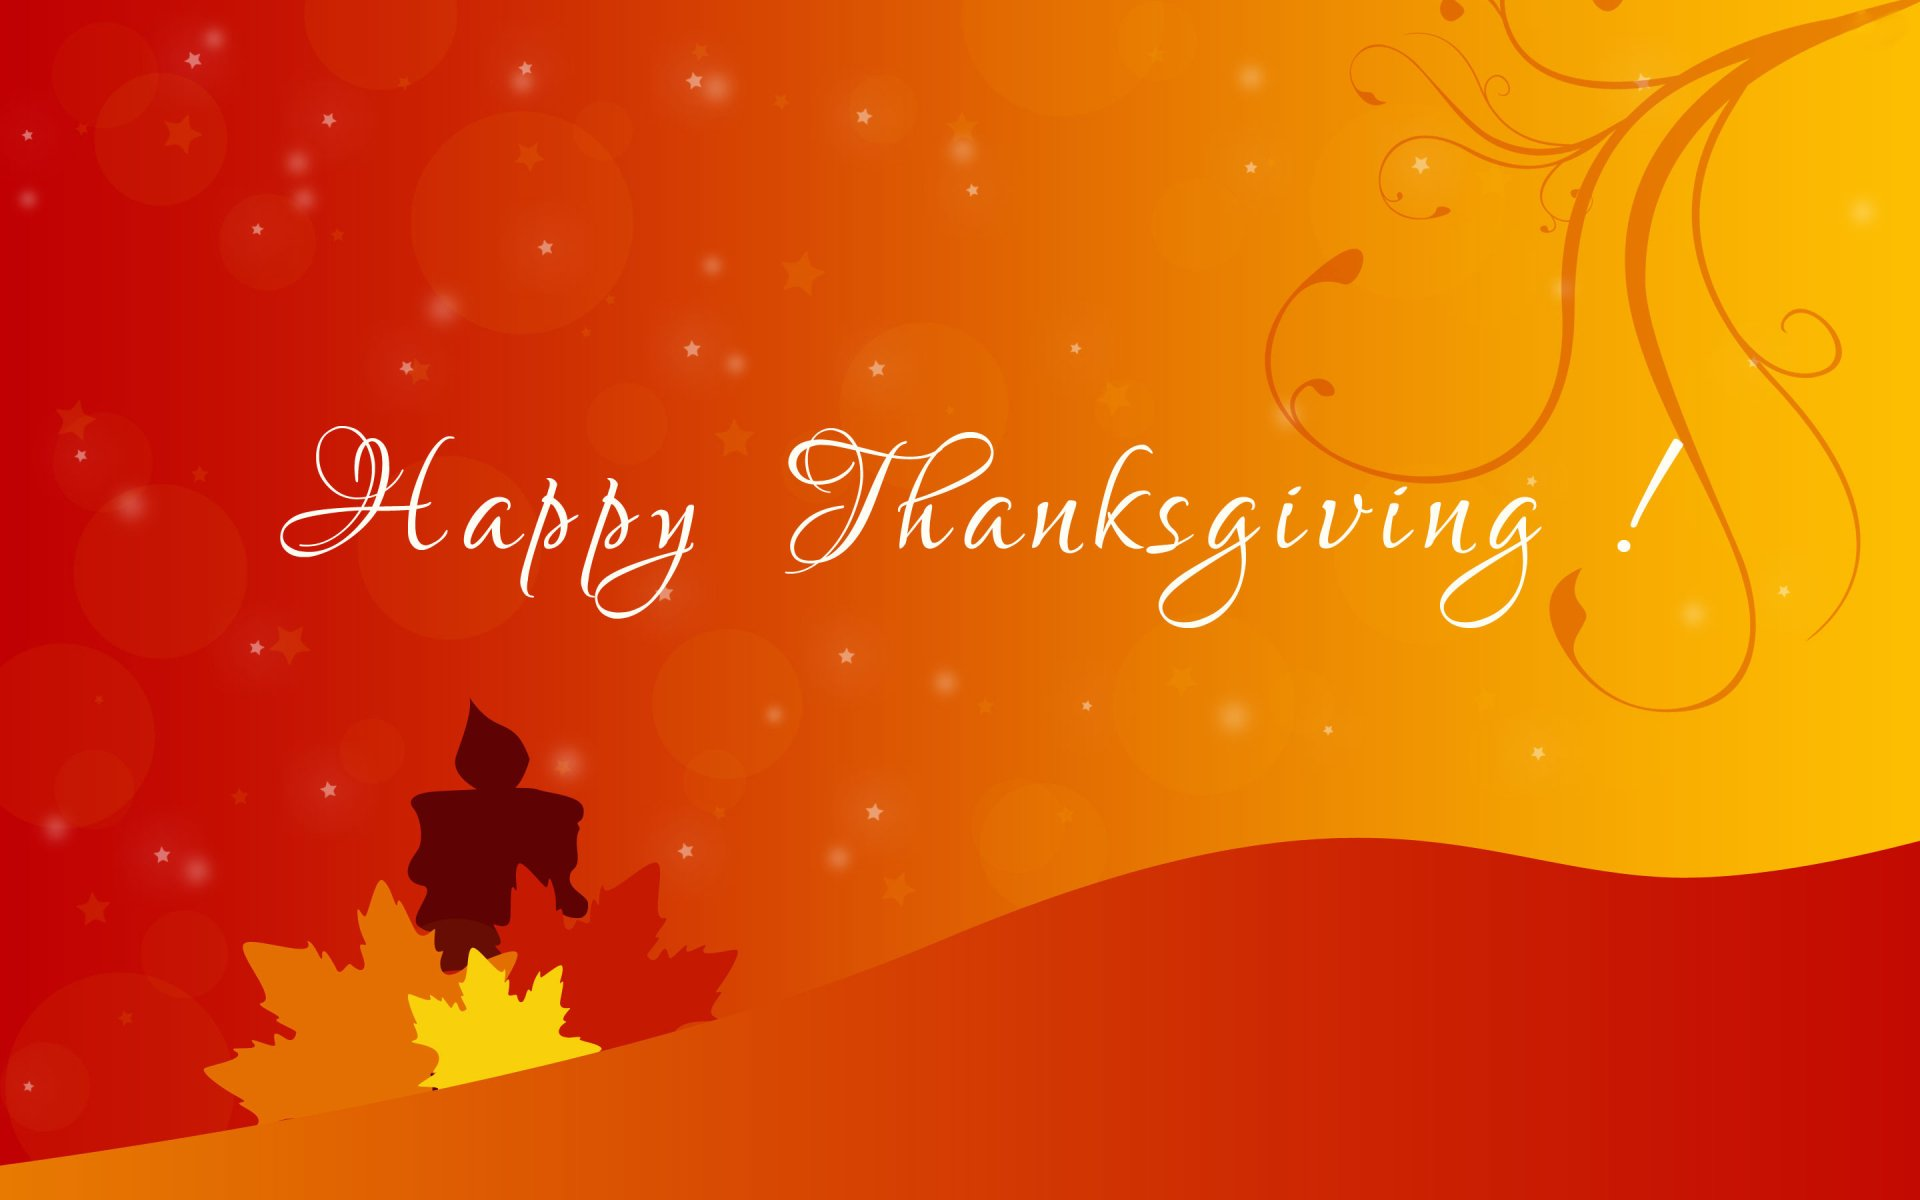 Holiday - Thanksgiving  Wallpaper